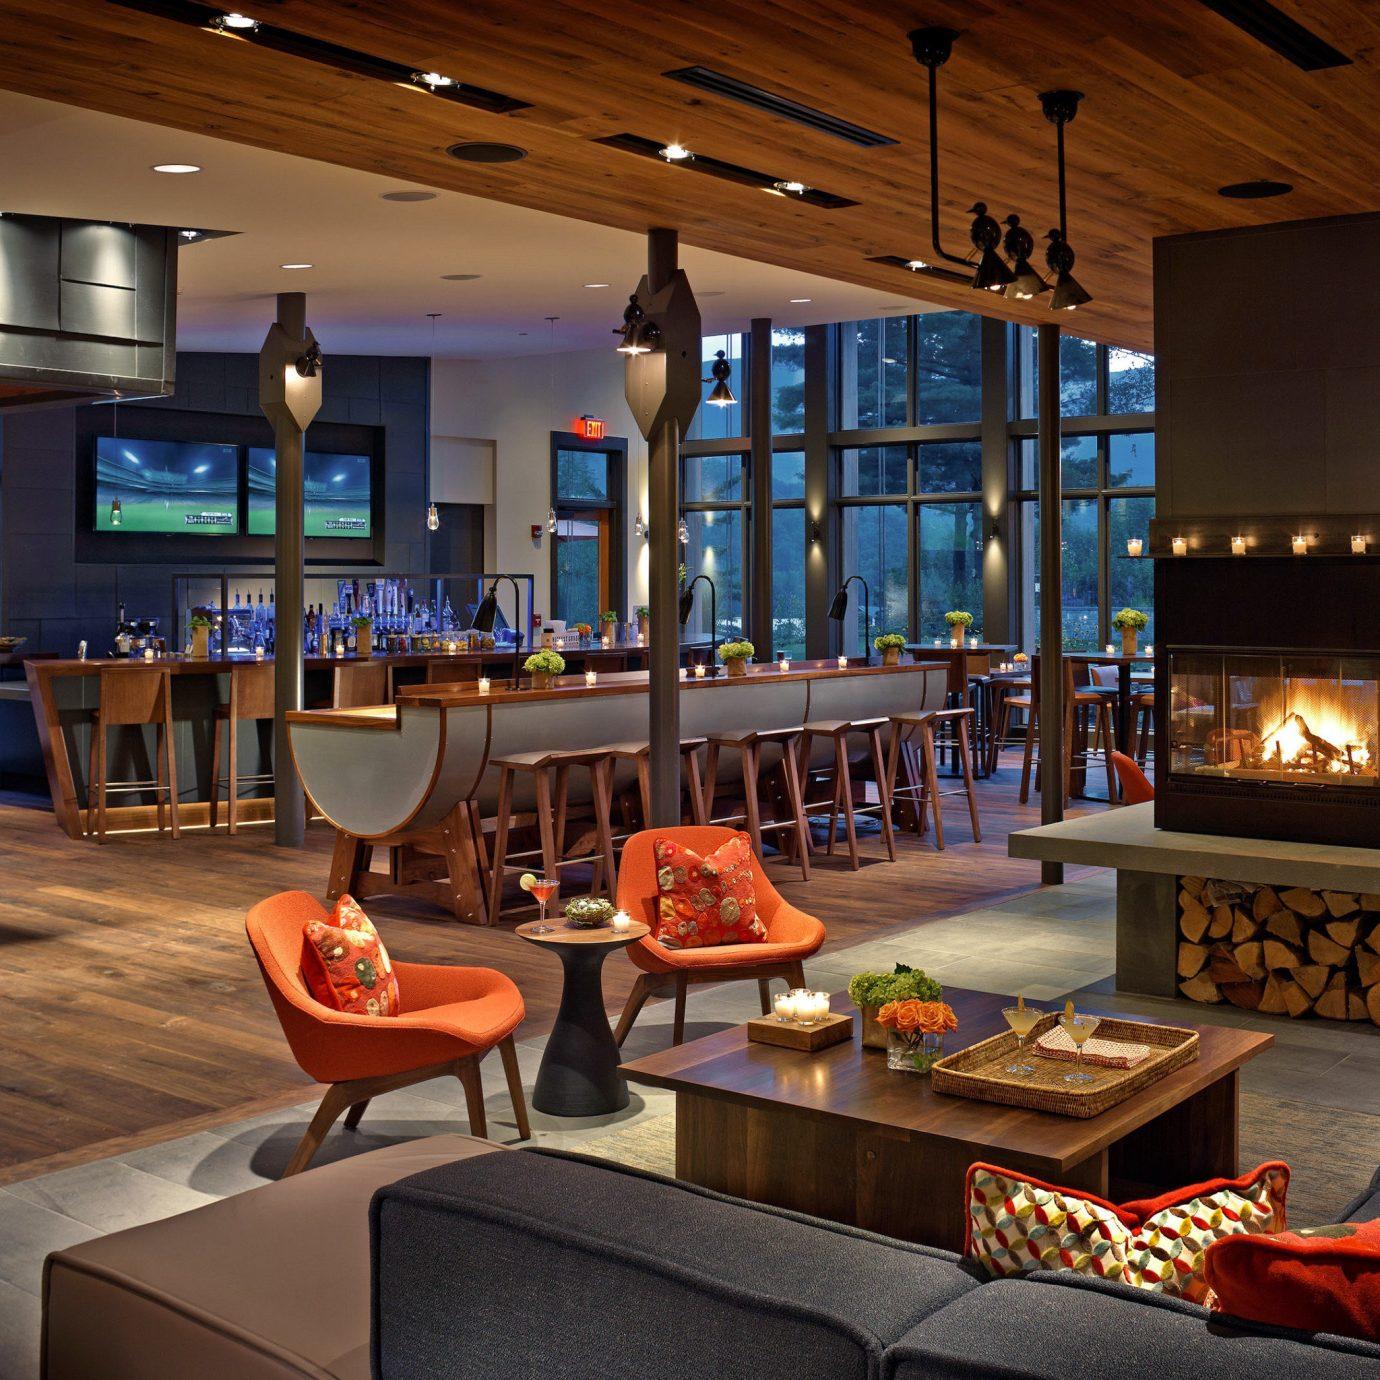 Bar Country Dining Drink Eat Lodge Resort Trip Ideas recreation room Lobby living room home billiard room orange